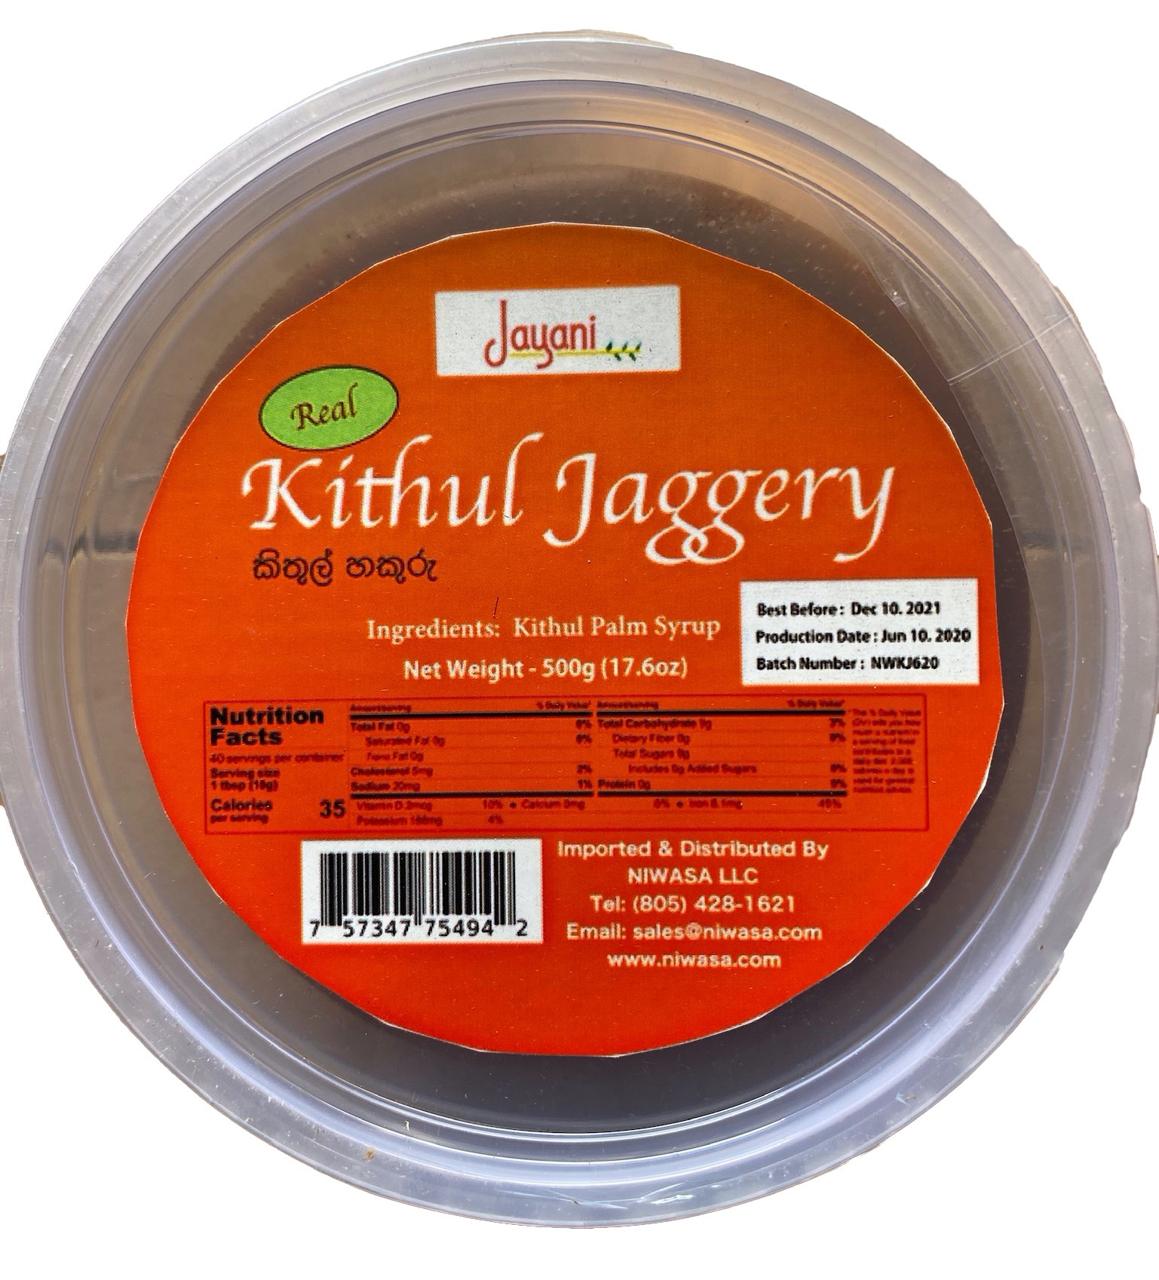 Picture of Jayani Real Kithul Jaggery (Kithul Hakuru) 500g